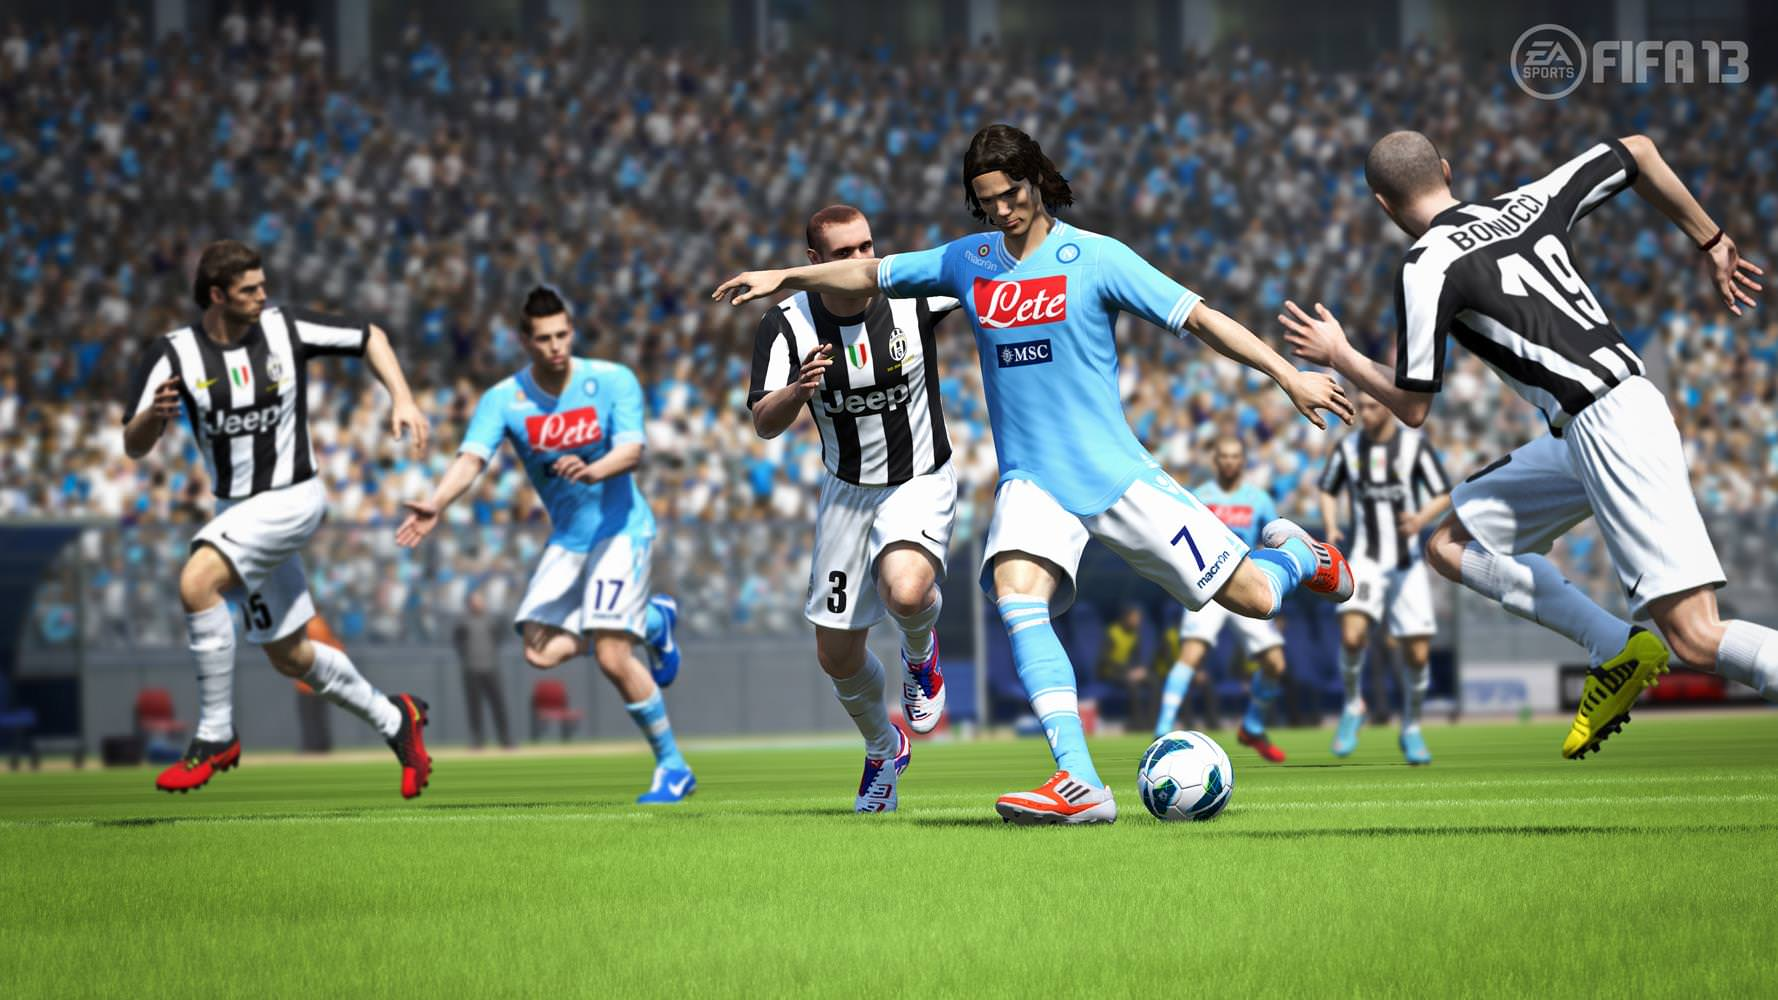 FIFA 13 Napoli